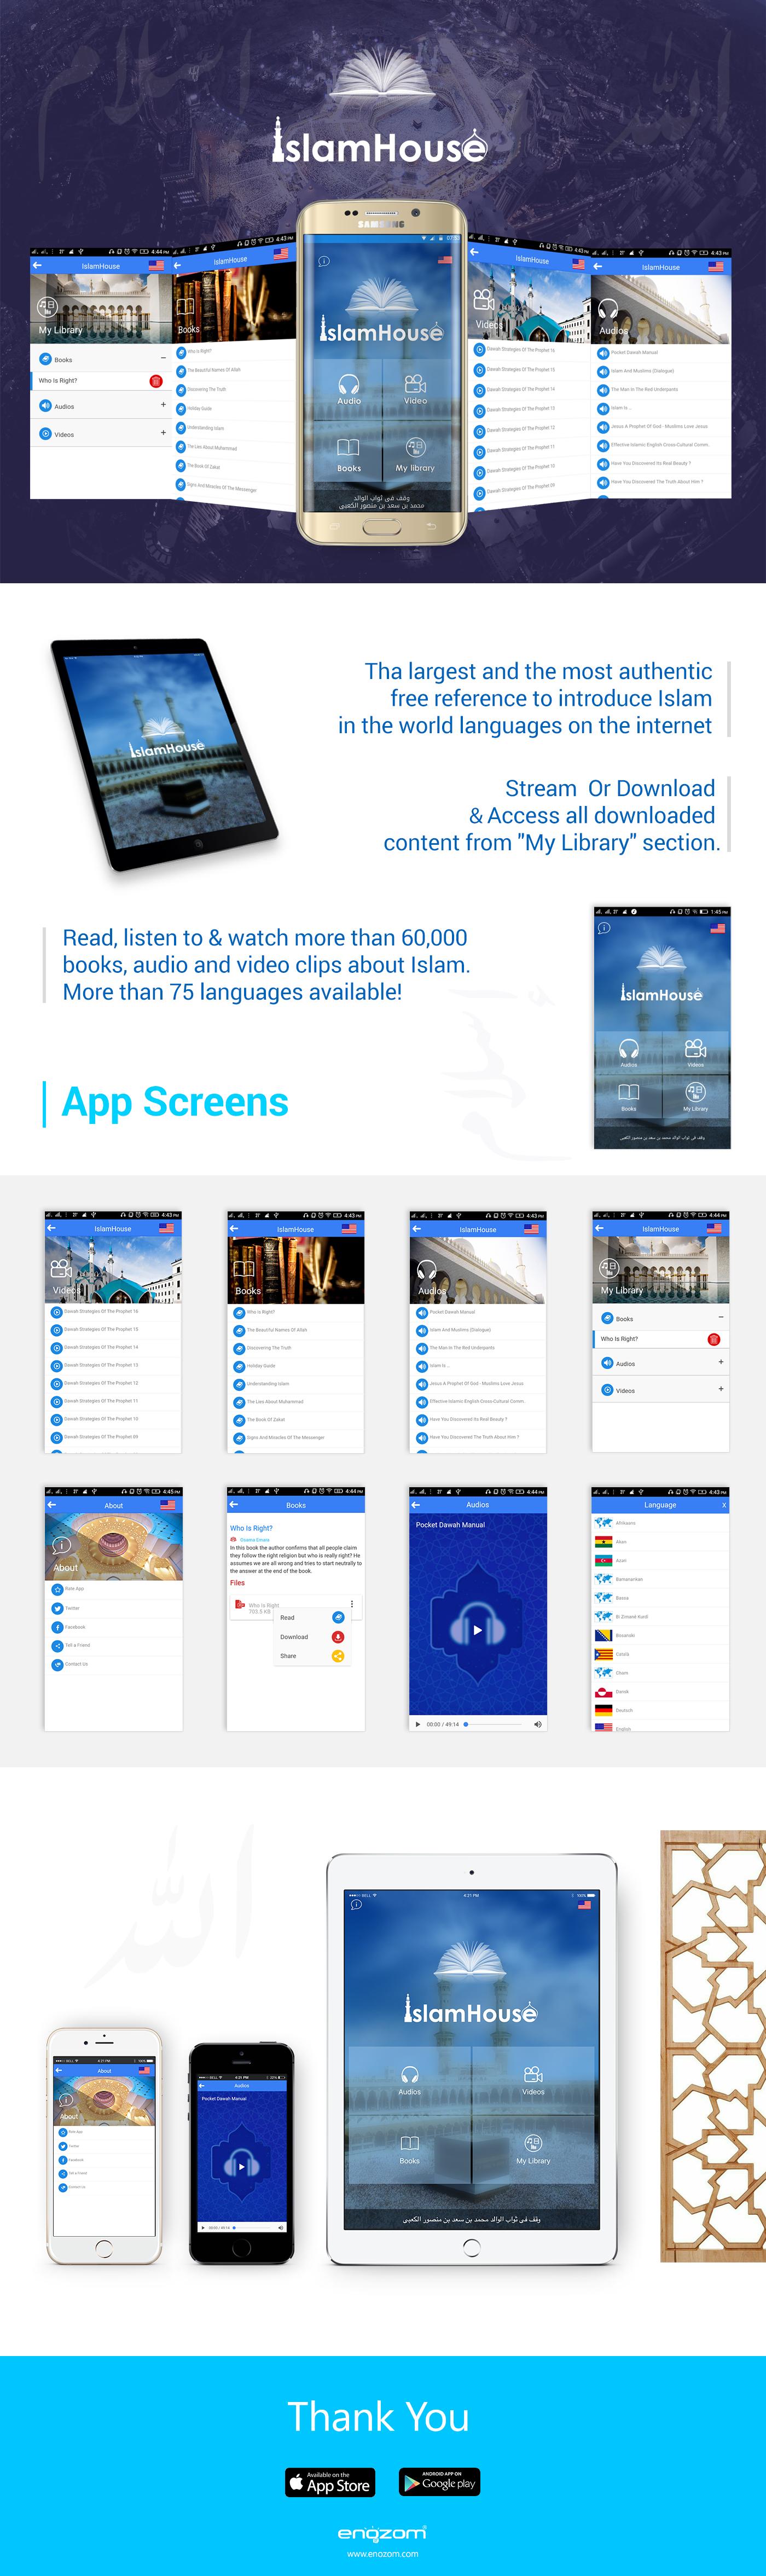 mobile app application Ionic design islam development